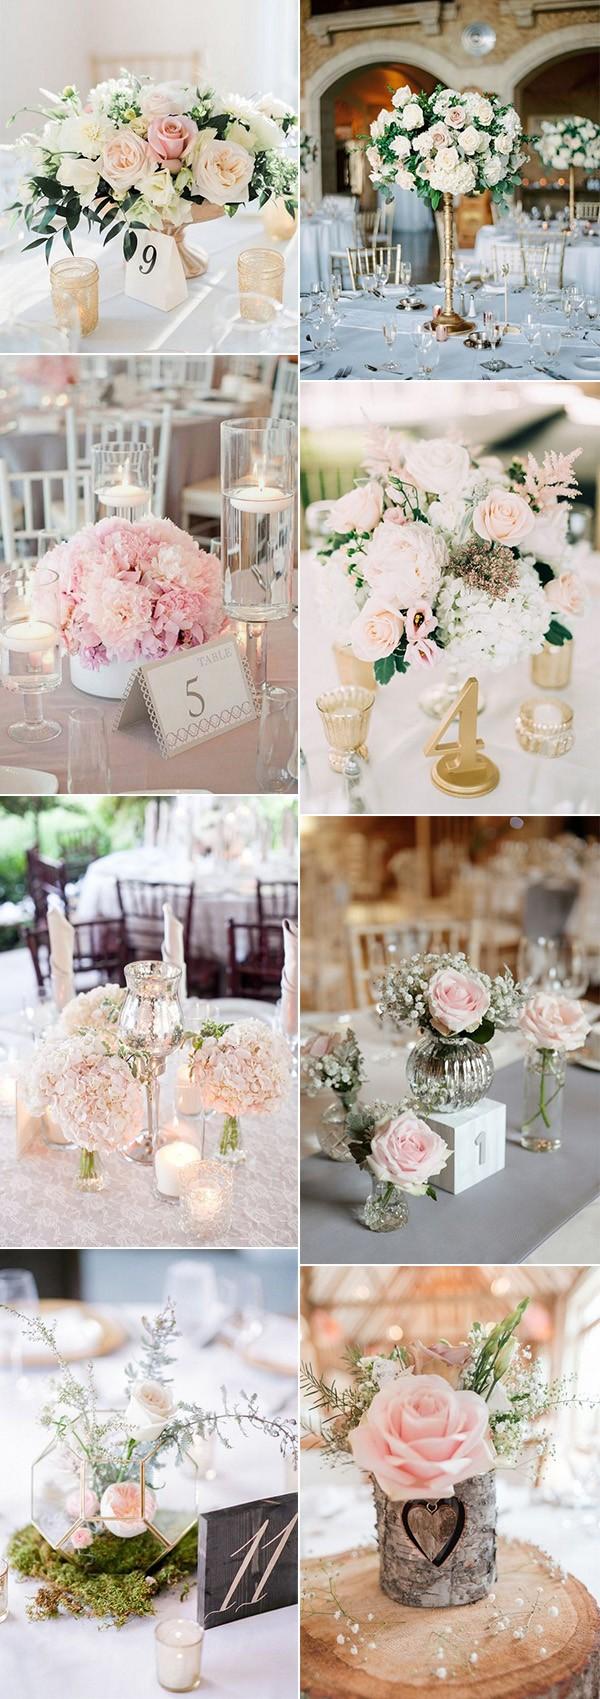 blush pink wedding centerpiece ideas for 2018 trends